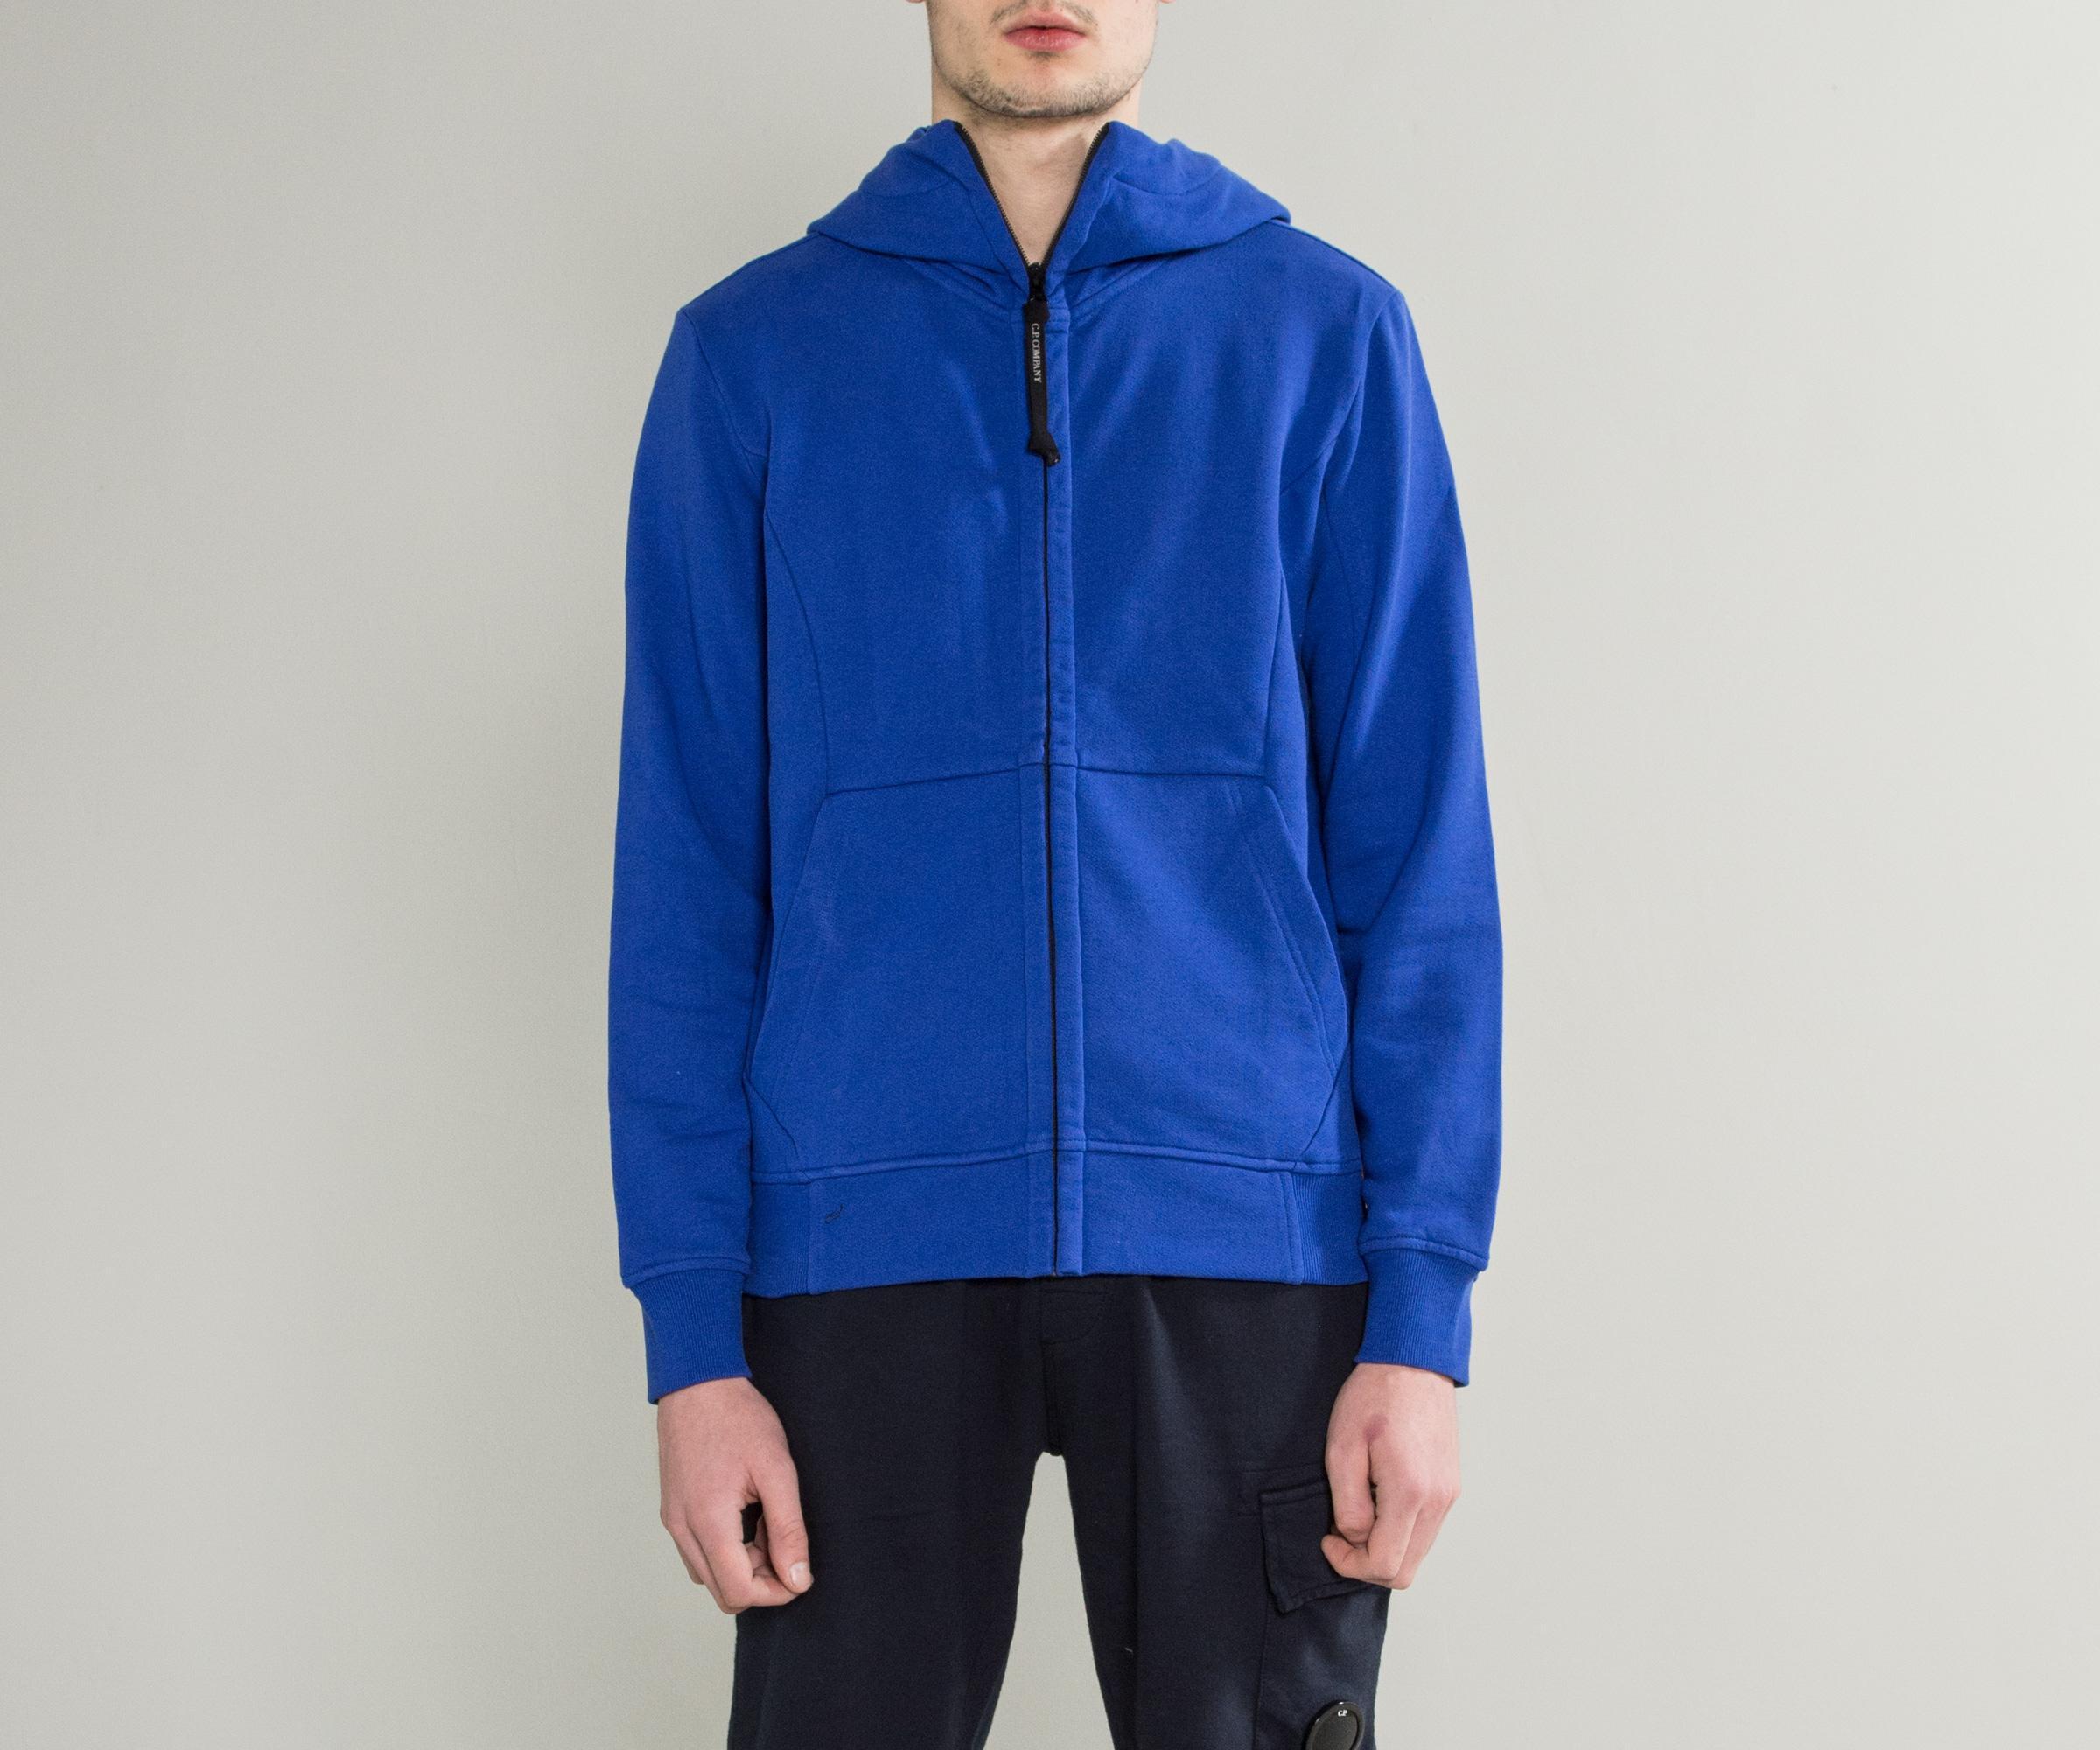 C P Company Full Zip Goggle Hooded Sweatshirt Royal Blue for Men